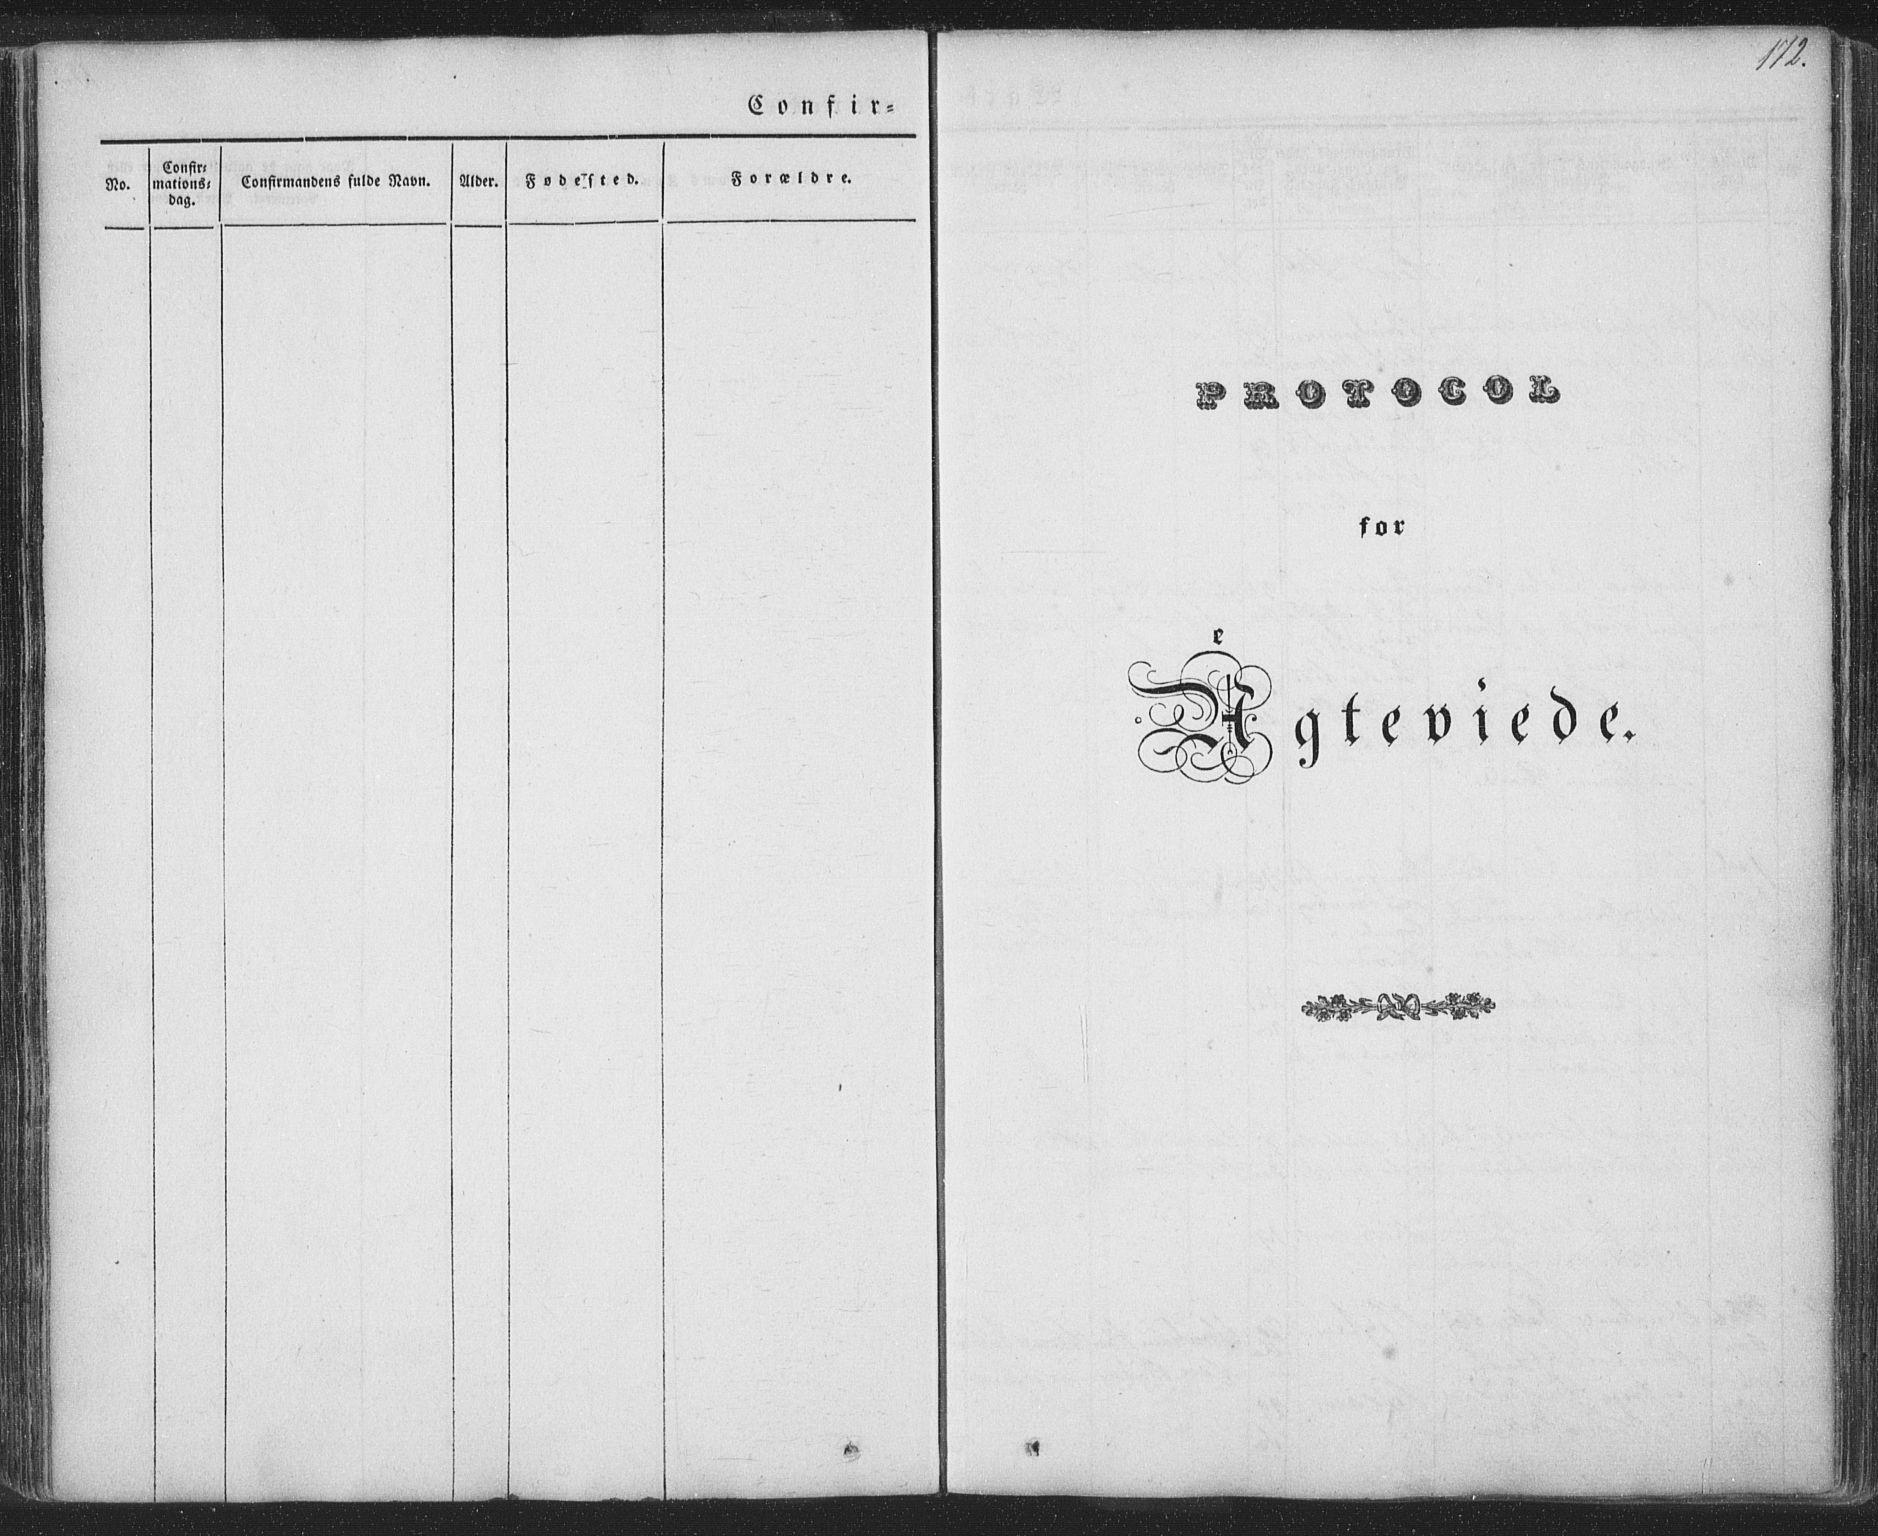 SAT, Ministerialprotokoller, klokkerbøker og fødselsregistre - Nordland, 885/L1202: Ministerialbok nr. 885A03, 1838-1859, s. 172